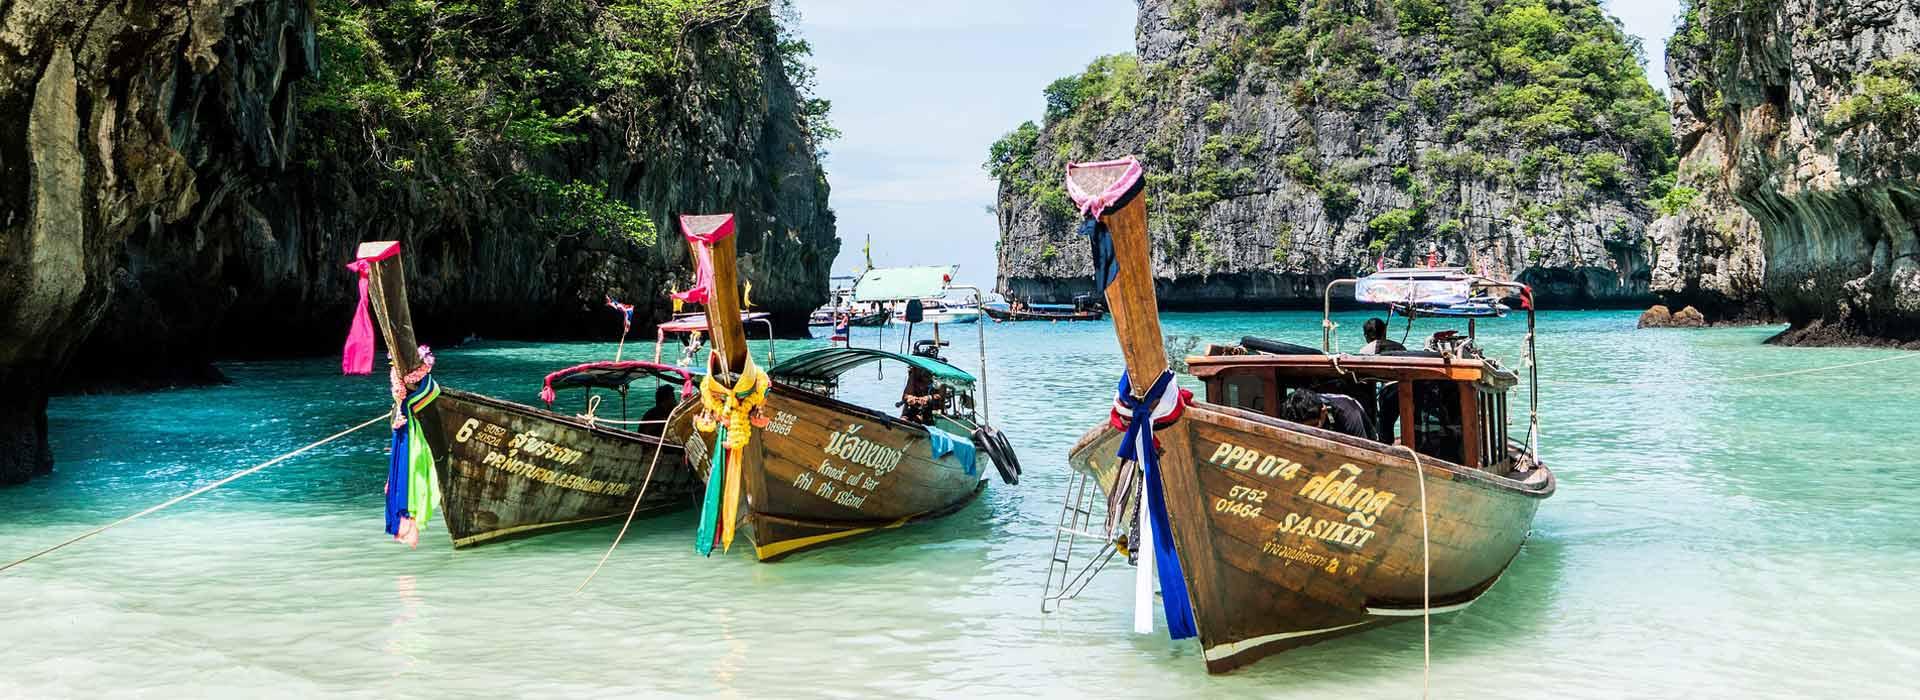 3D2N F&E Phuket LP Phuket